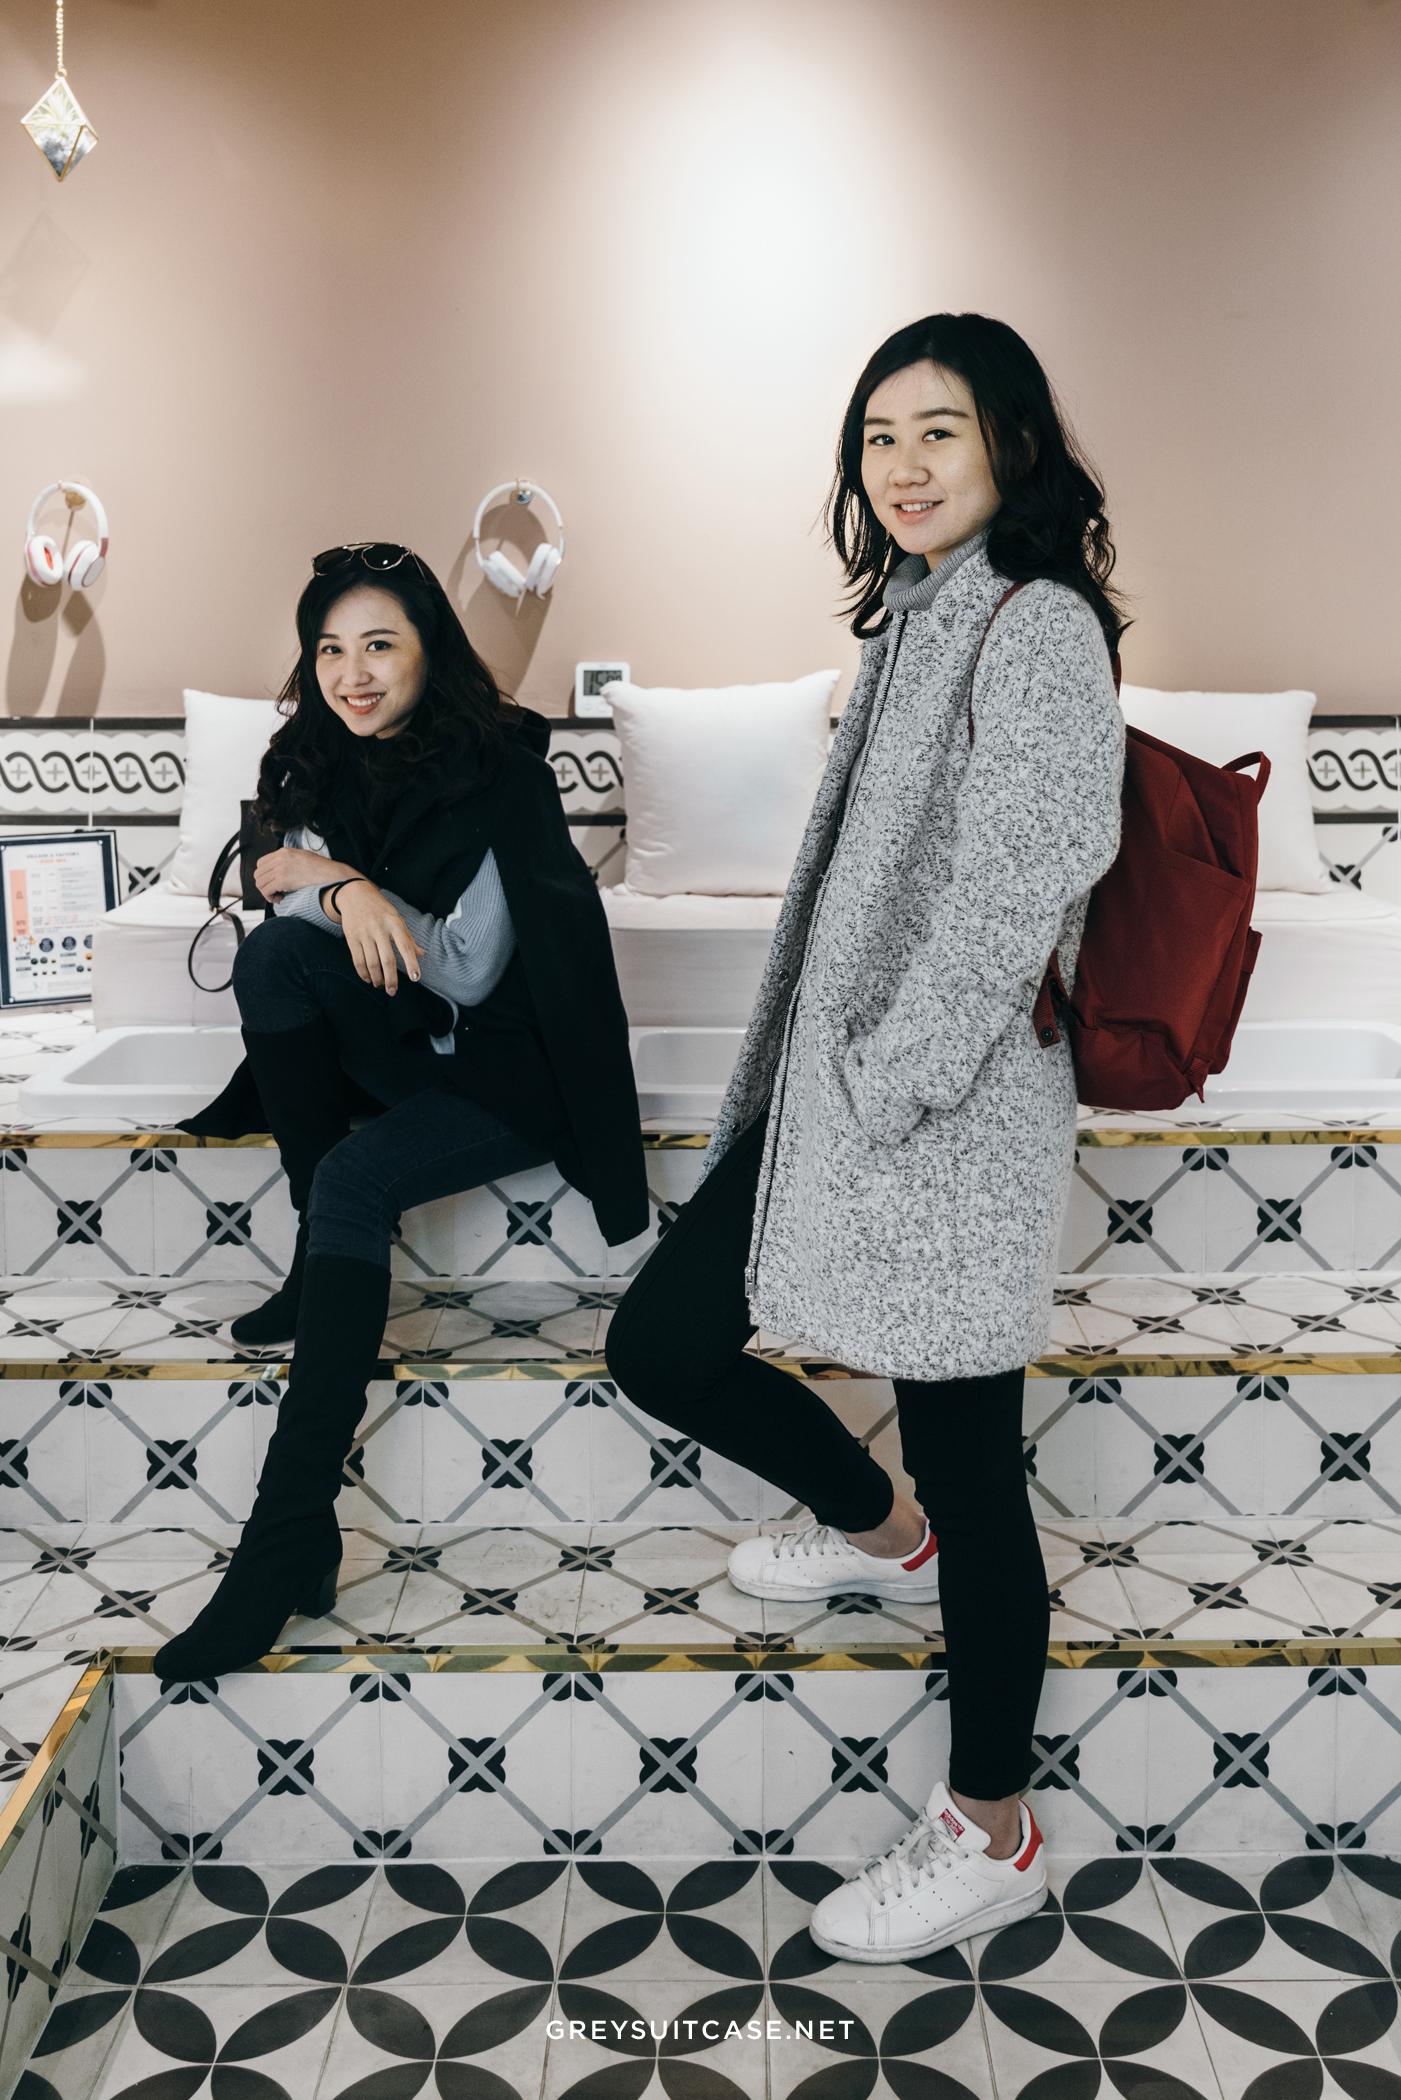 Greysuitcase Travel Series - Seoul Spring '17 - Village 11 Factory (빌라쥬11팩토리), Garosugil (가로수길), Seoul, South Korea